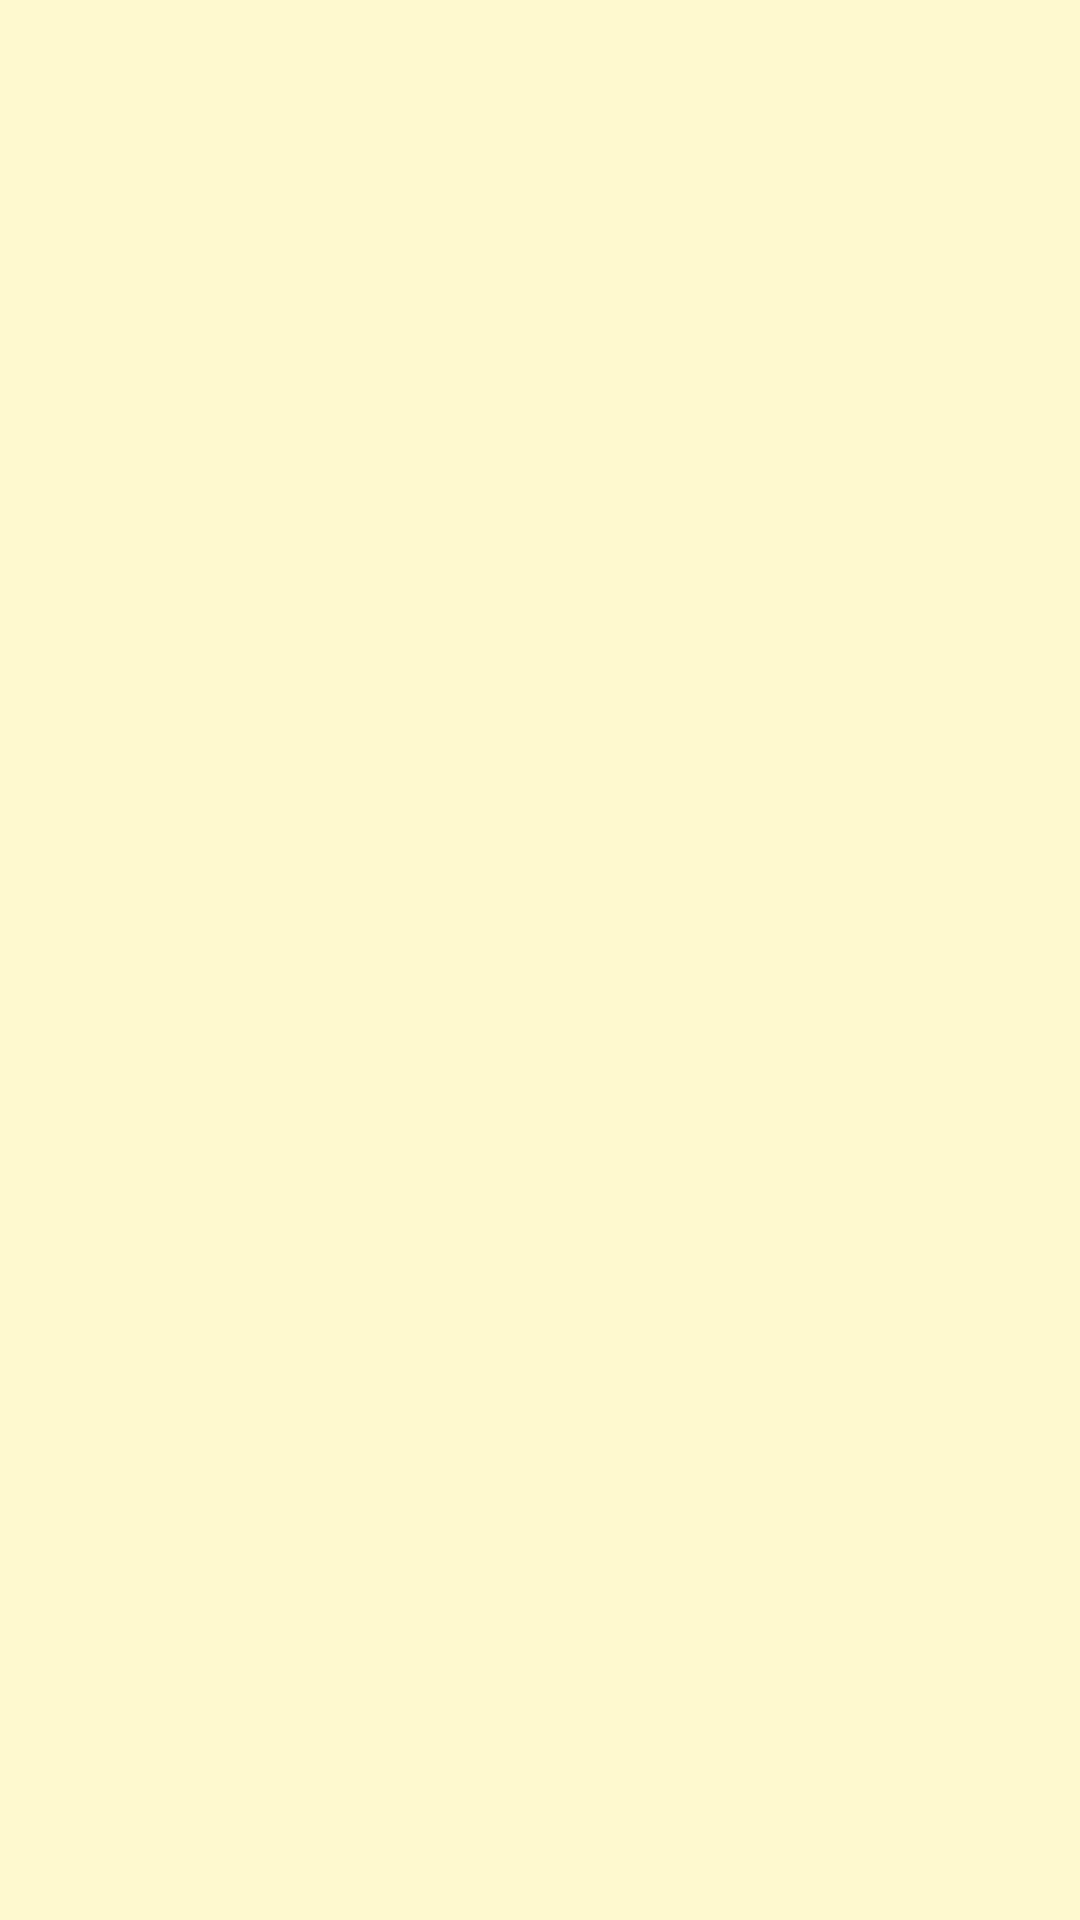 1080x1920 Lemon Chiffon Solid Color Background